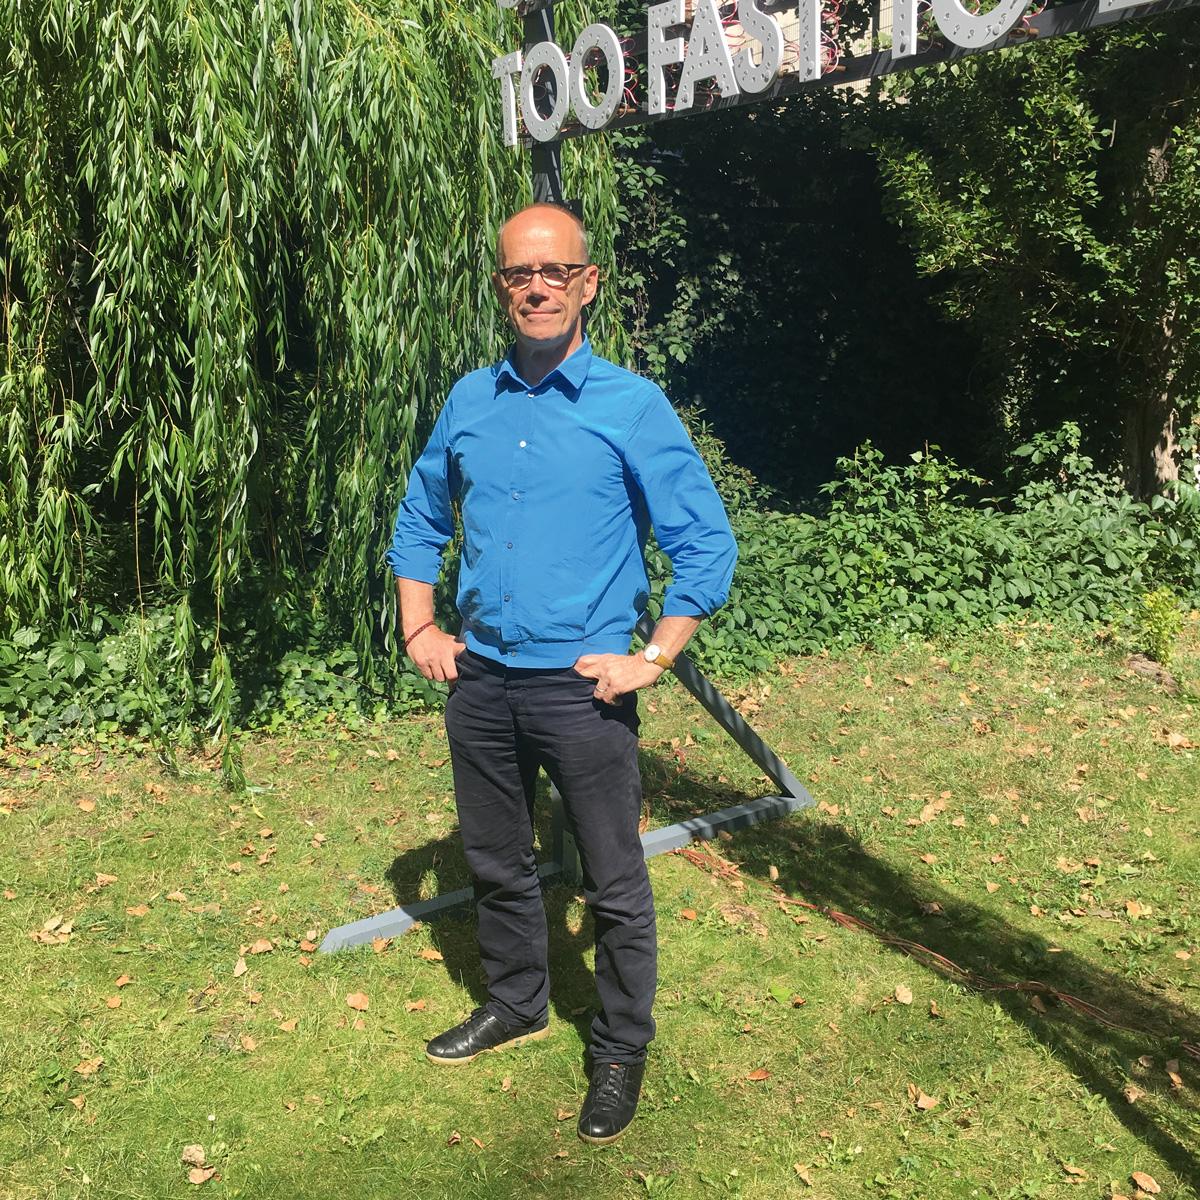 Erik-Spiekermann-Designregeln-10-2016